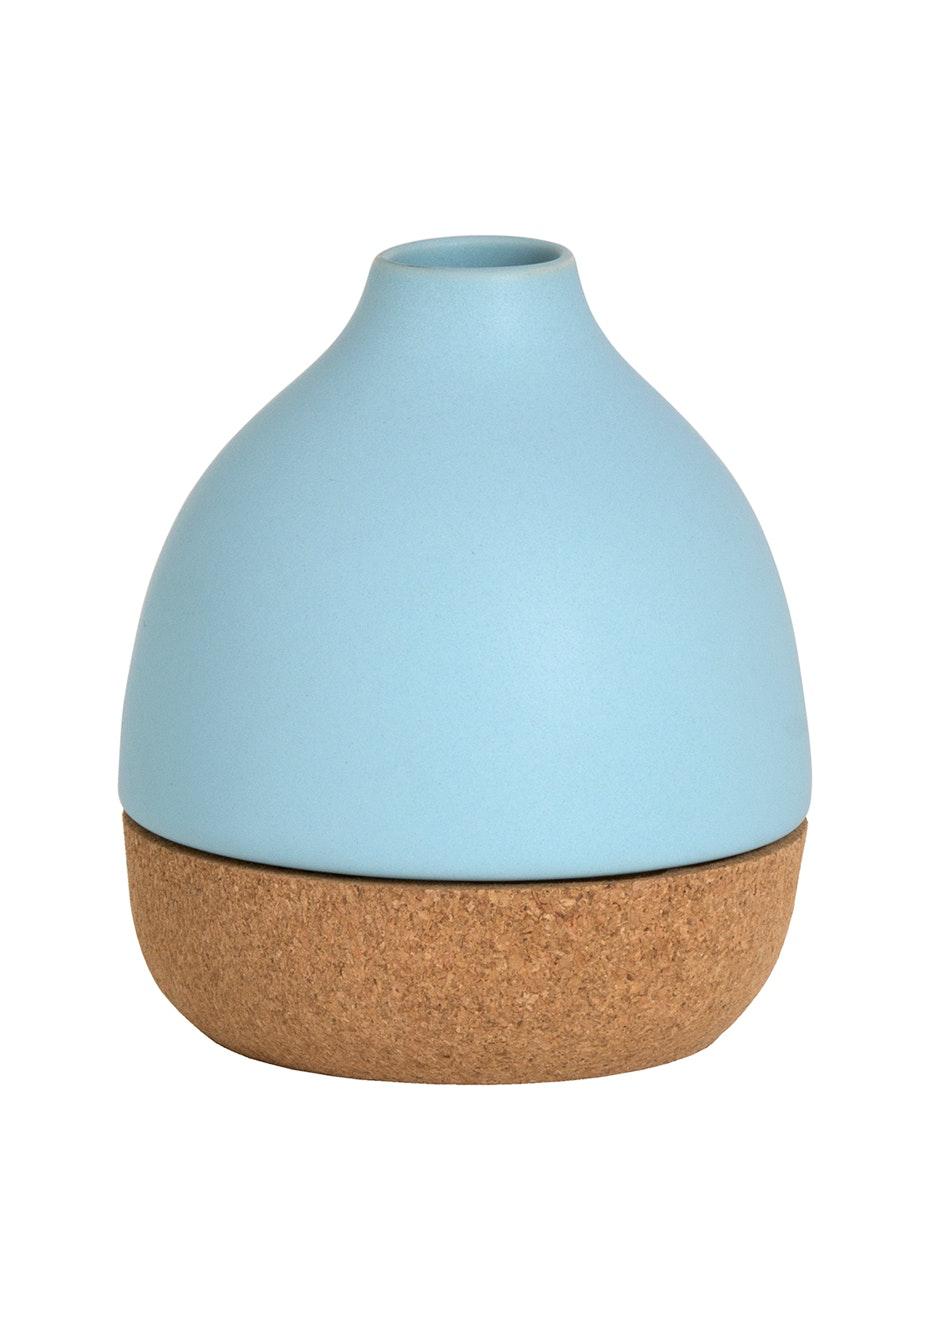 Cork Base Vase - Duck Egg/Cork